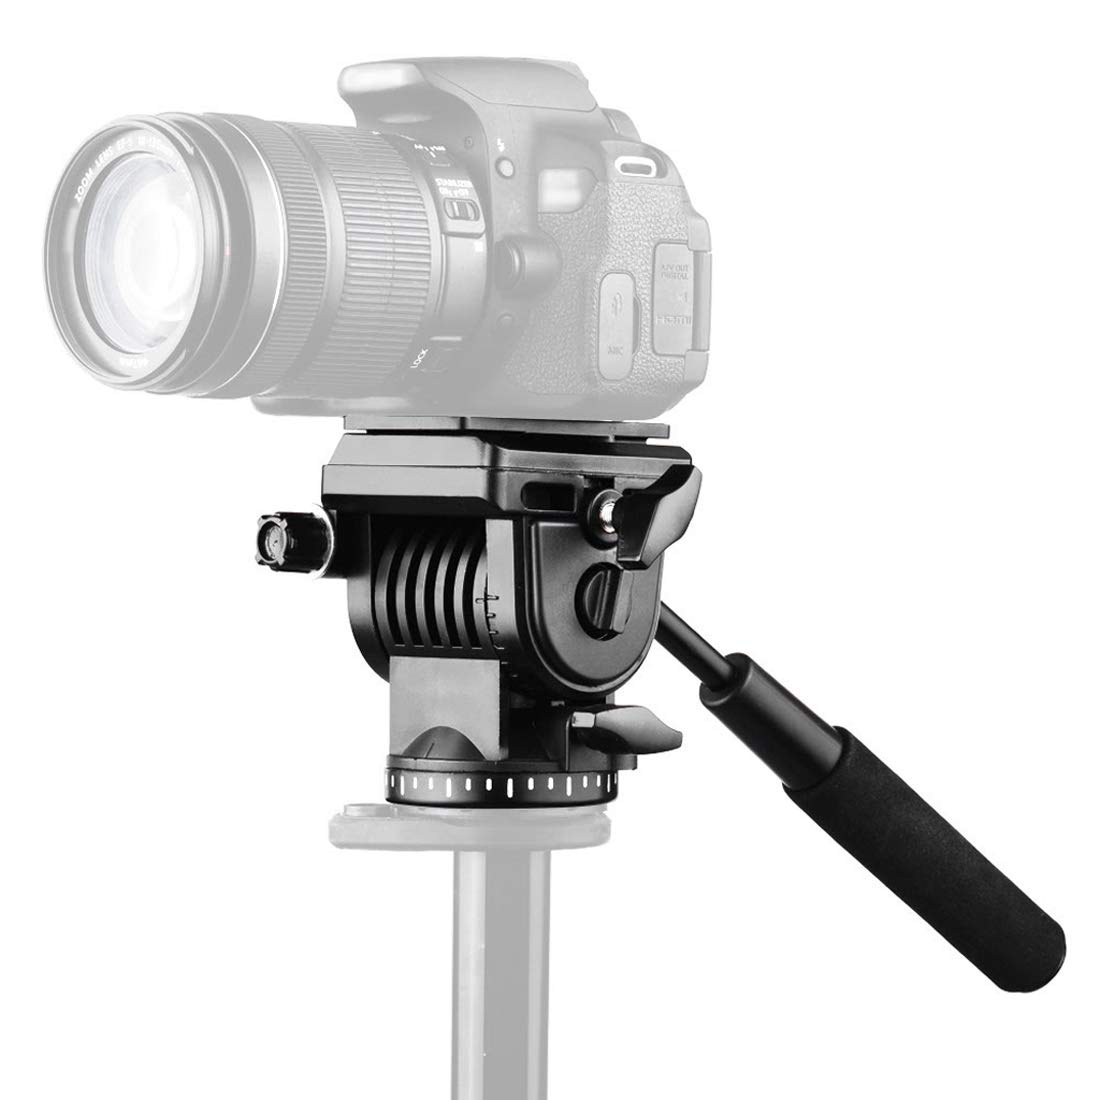 Dig 犬用骨 プラスチック 高耐久 ビデオカメラ 3次元三脚 アクション 液体 ドラッグヘッド スライドプレート付き デジタル一眼レフ/一眼レフカメラ用   B07L9NCQ8P